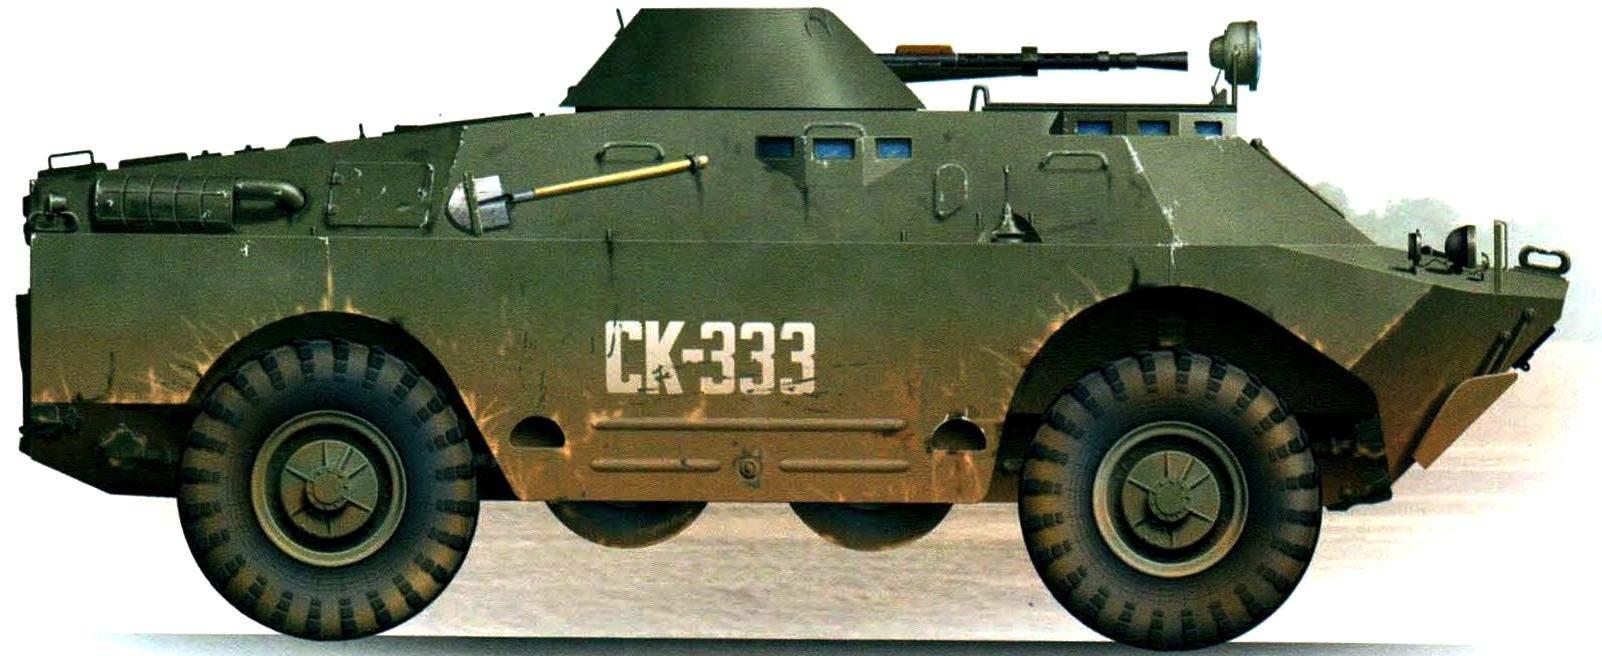 BRDM-2 of the internal troops of the Russian Federation. Stavropol Krai, 1995.